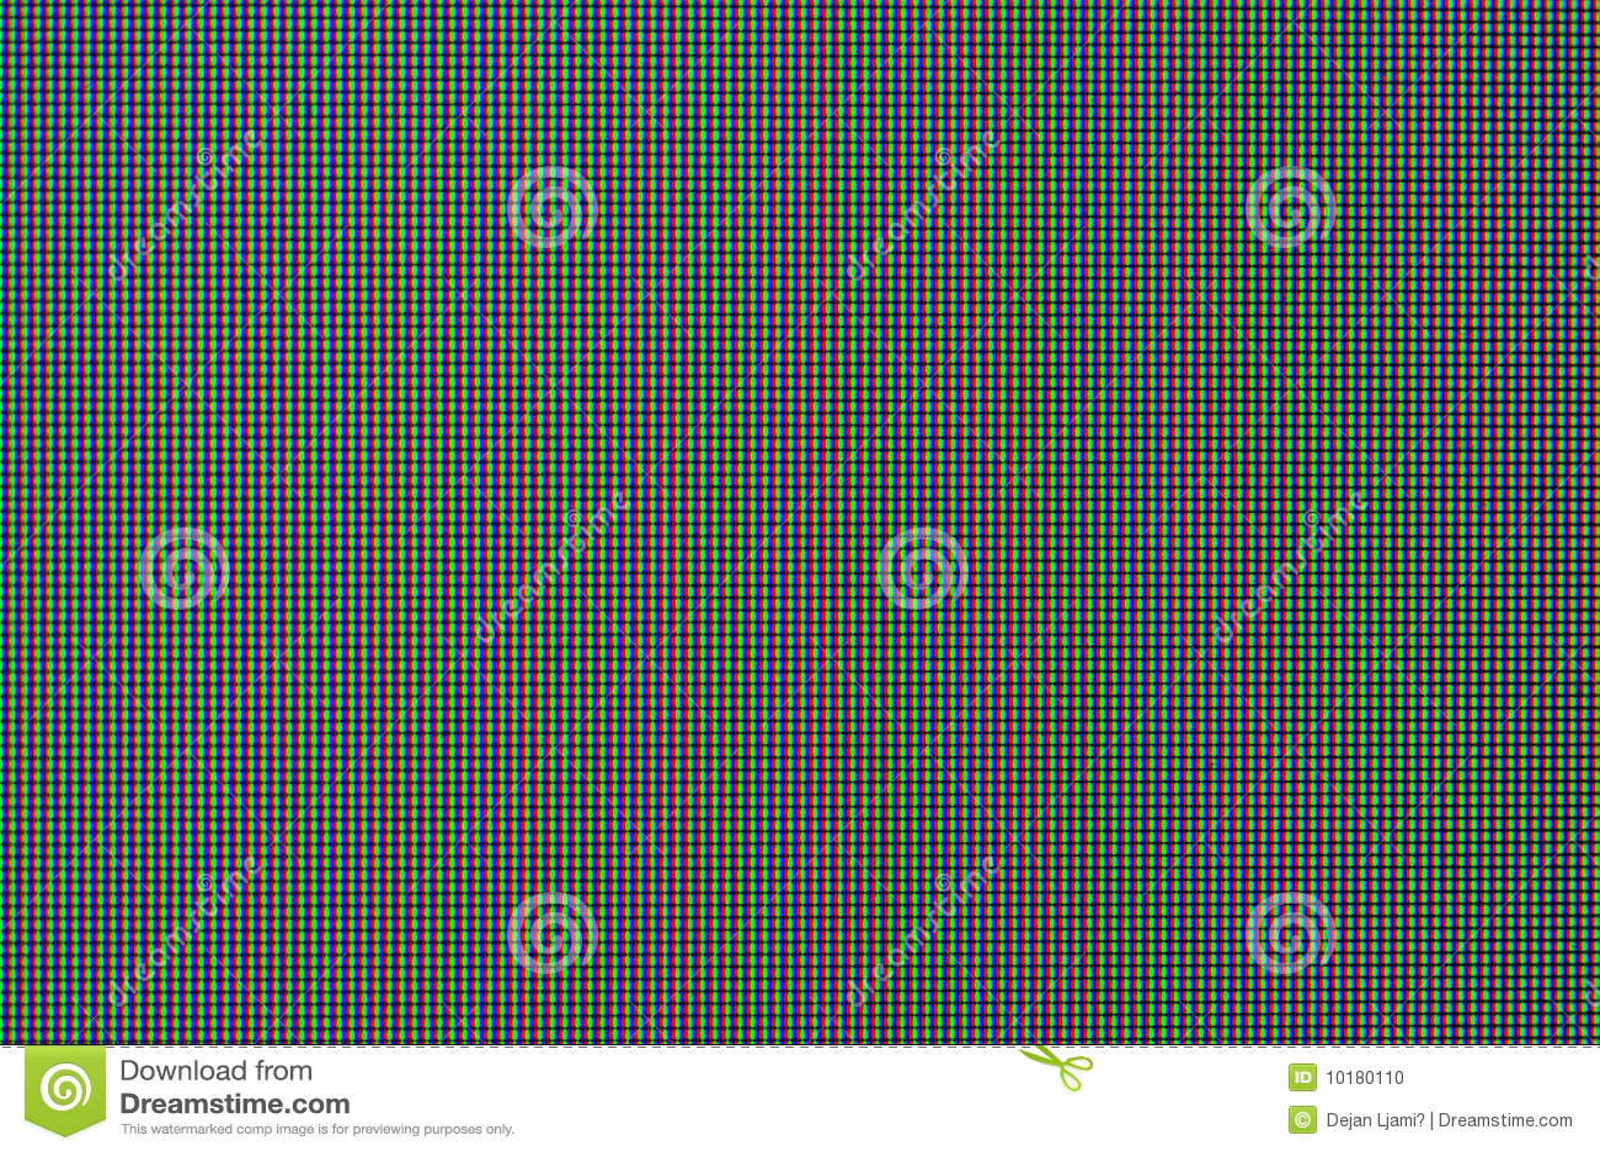 LCD Texture - RGB Dots Stock Photo - Image: 10180110